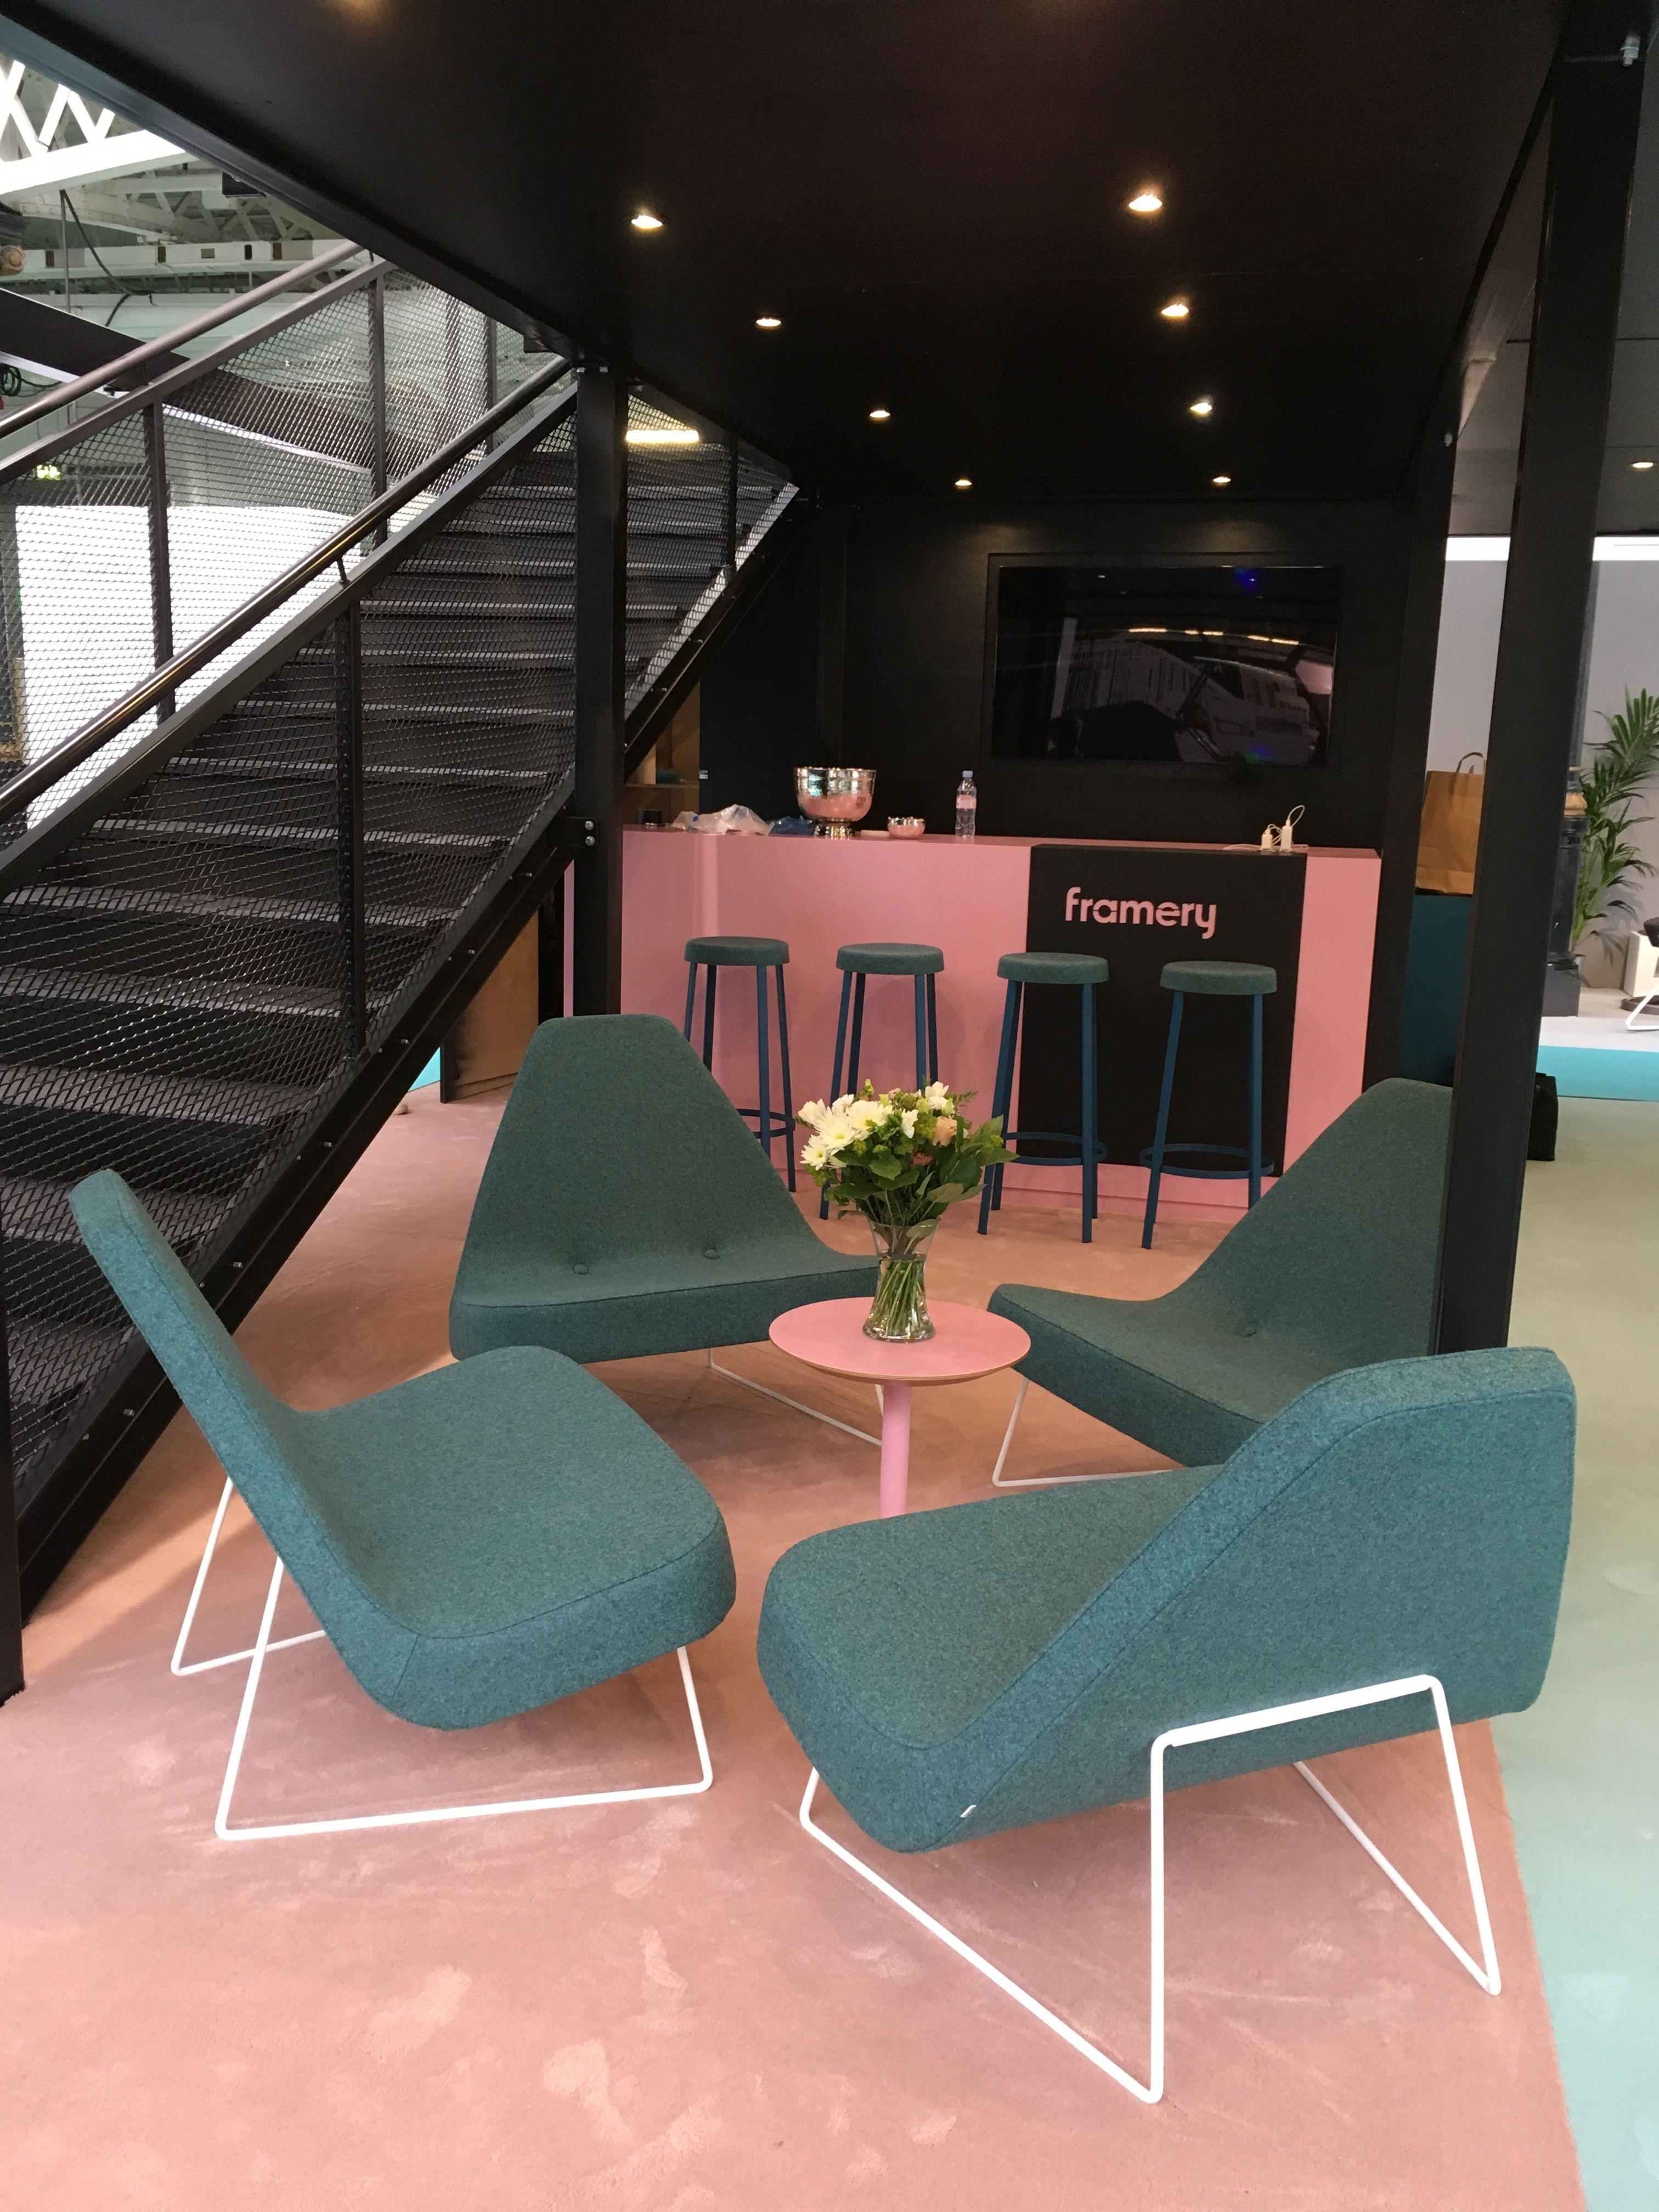 100 percent design 2017 at framery and office blueprint london 100 percent design 2017 at framery and office blueprint london design festival home decor malvernweather Gallery